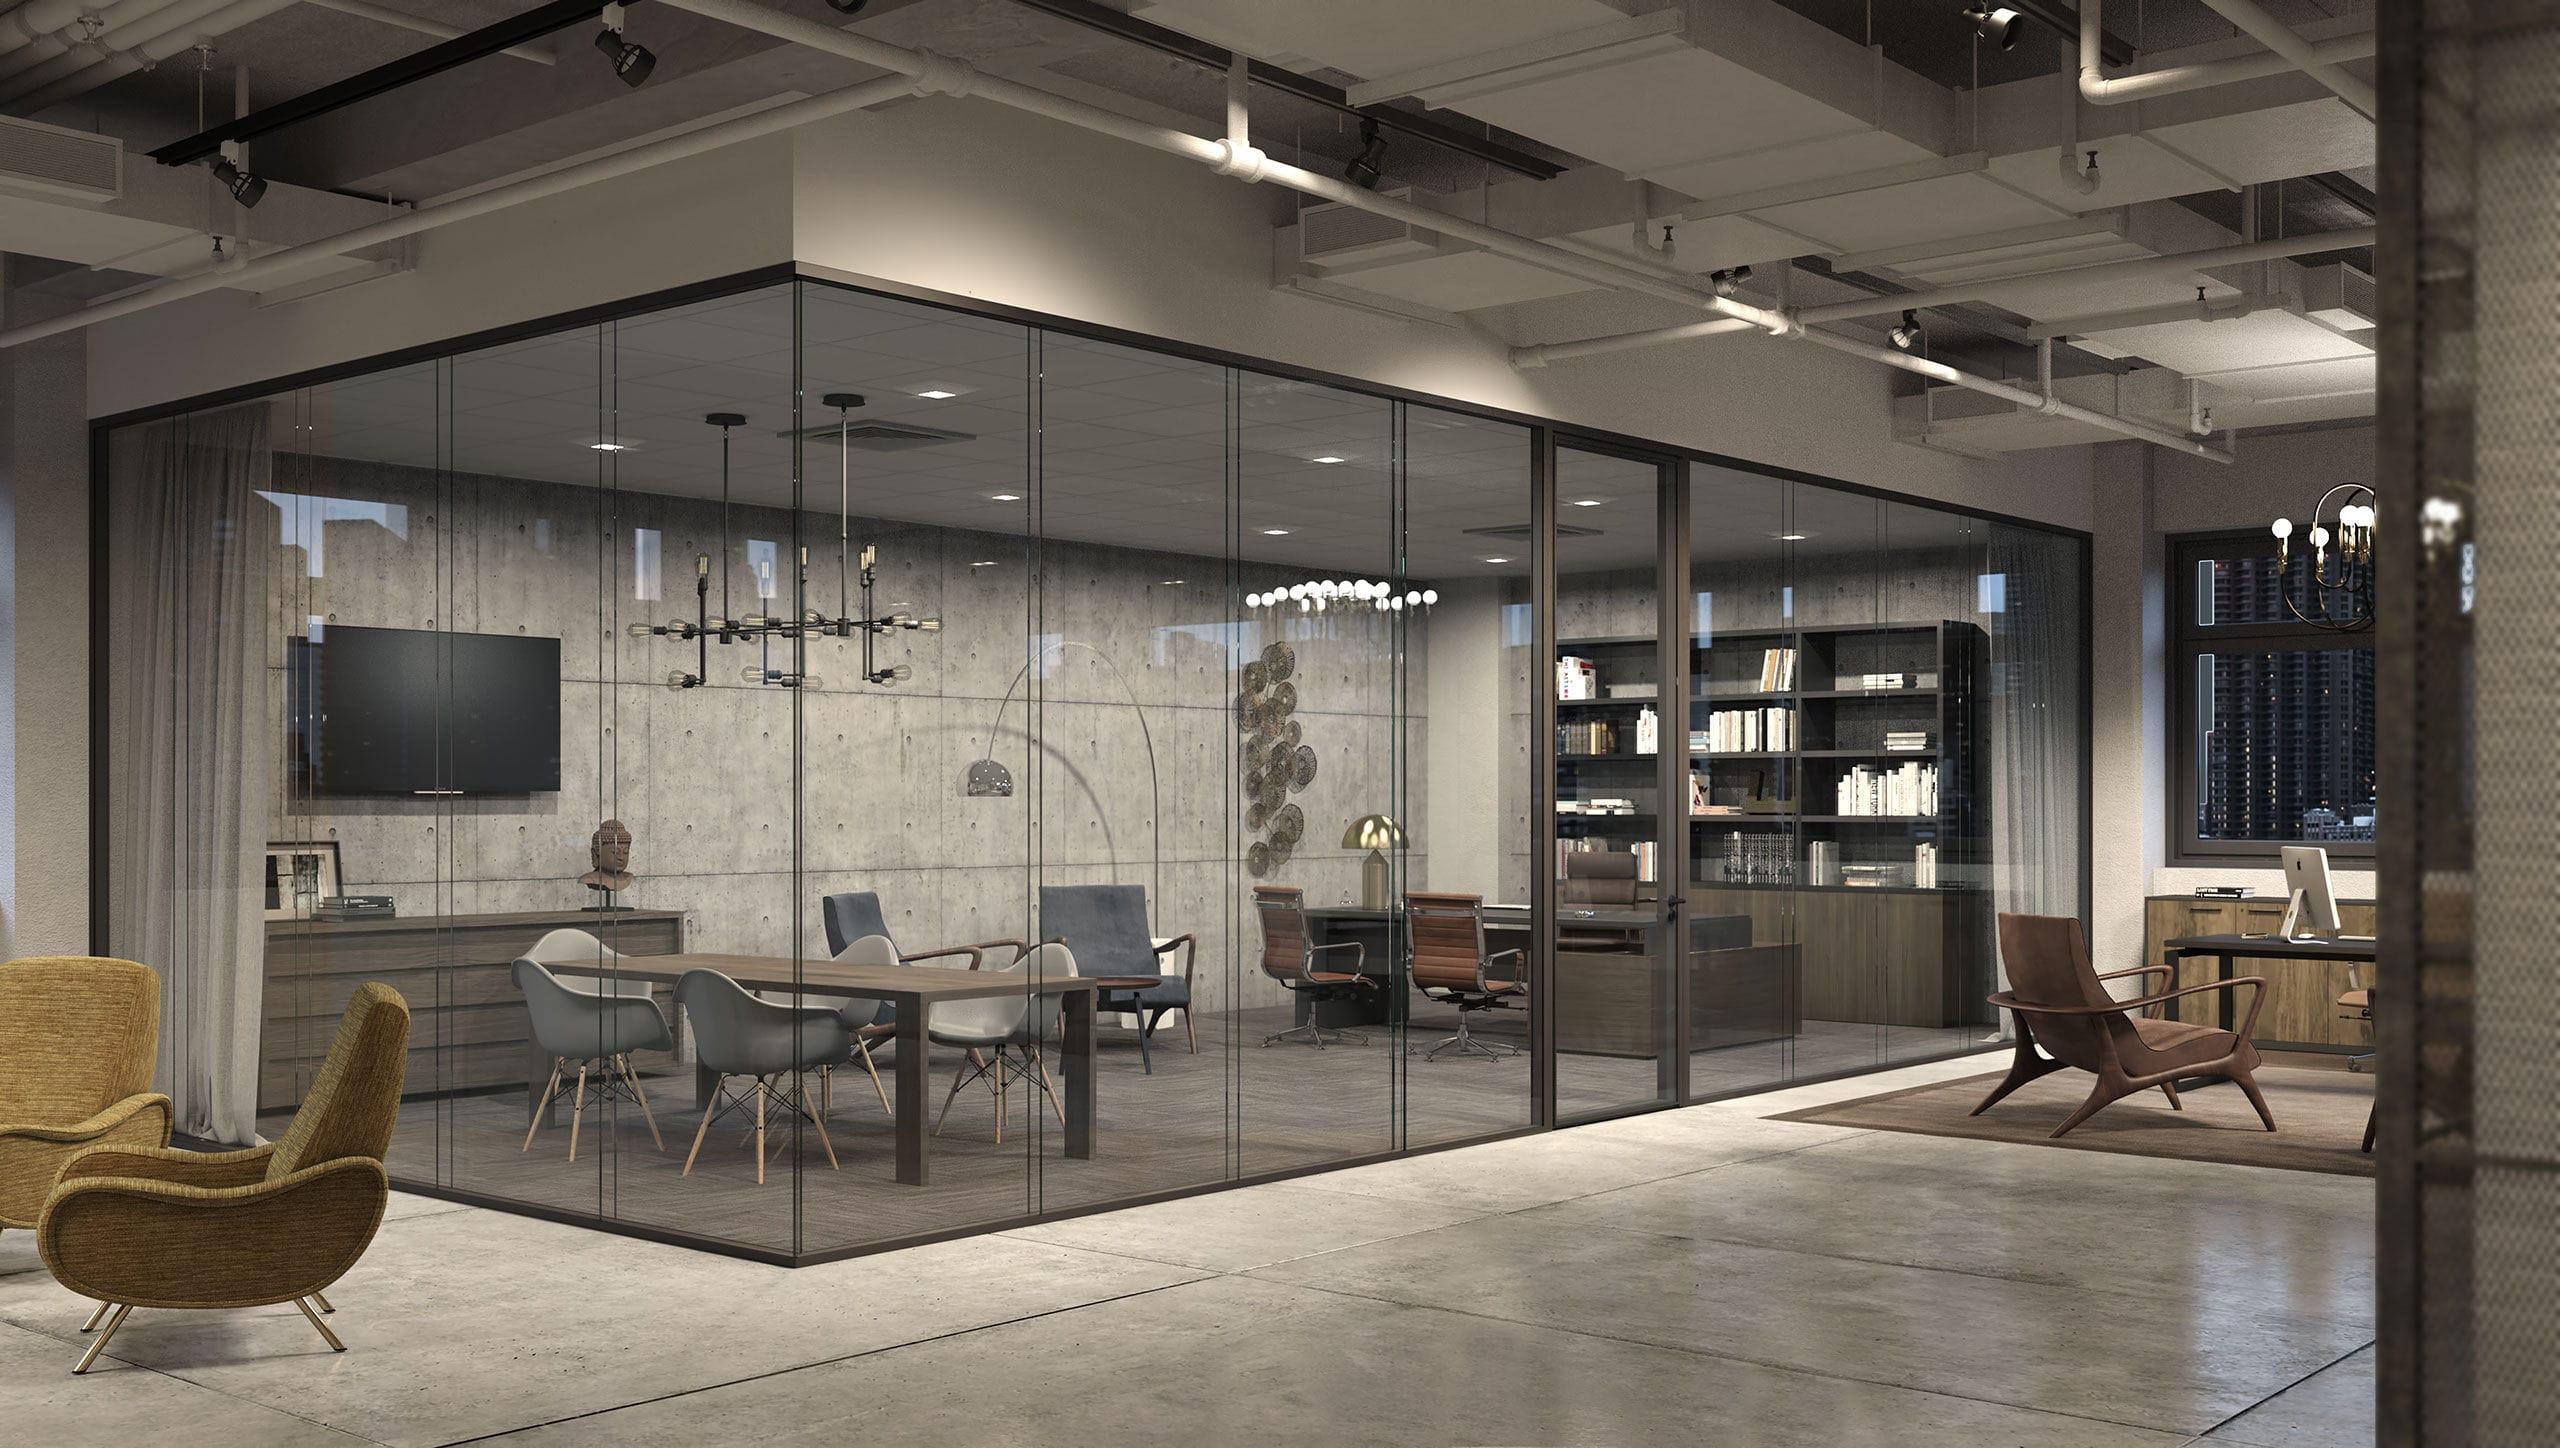 Büro design holz  Transportierbare Trennwand / aus Holz / verglast / Büro - FIMO ...